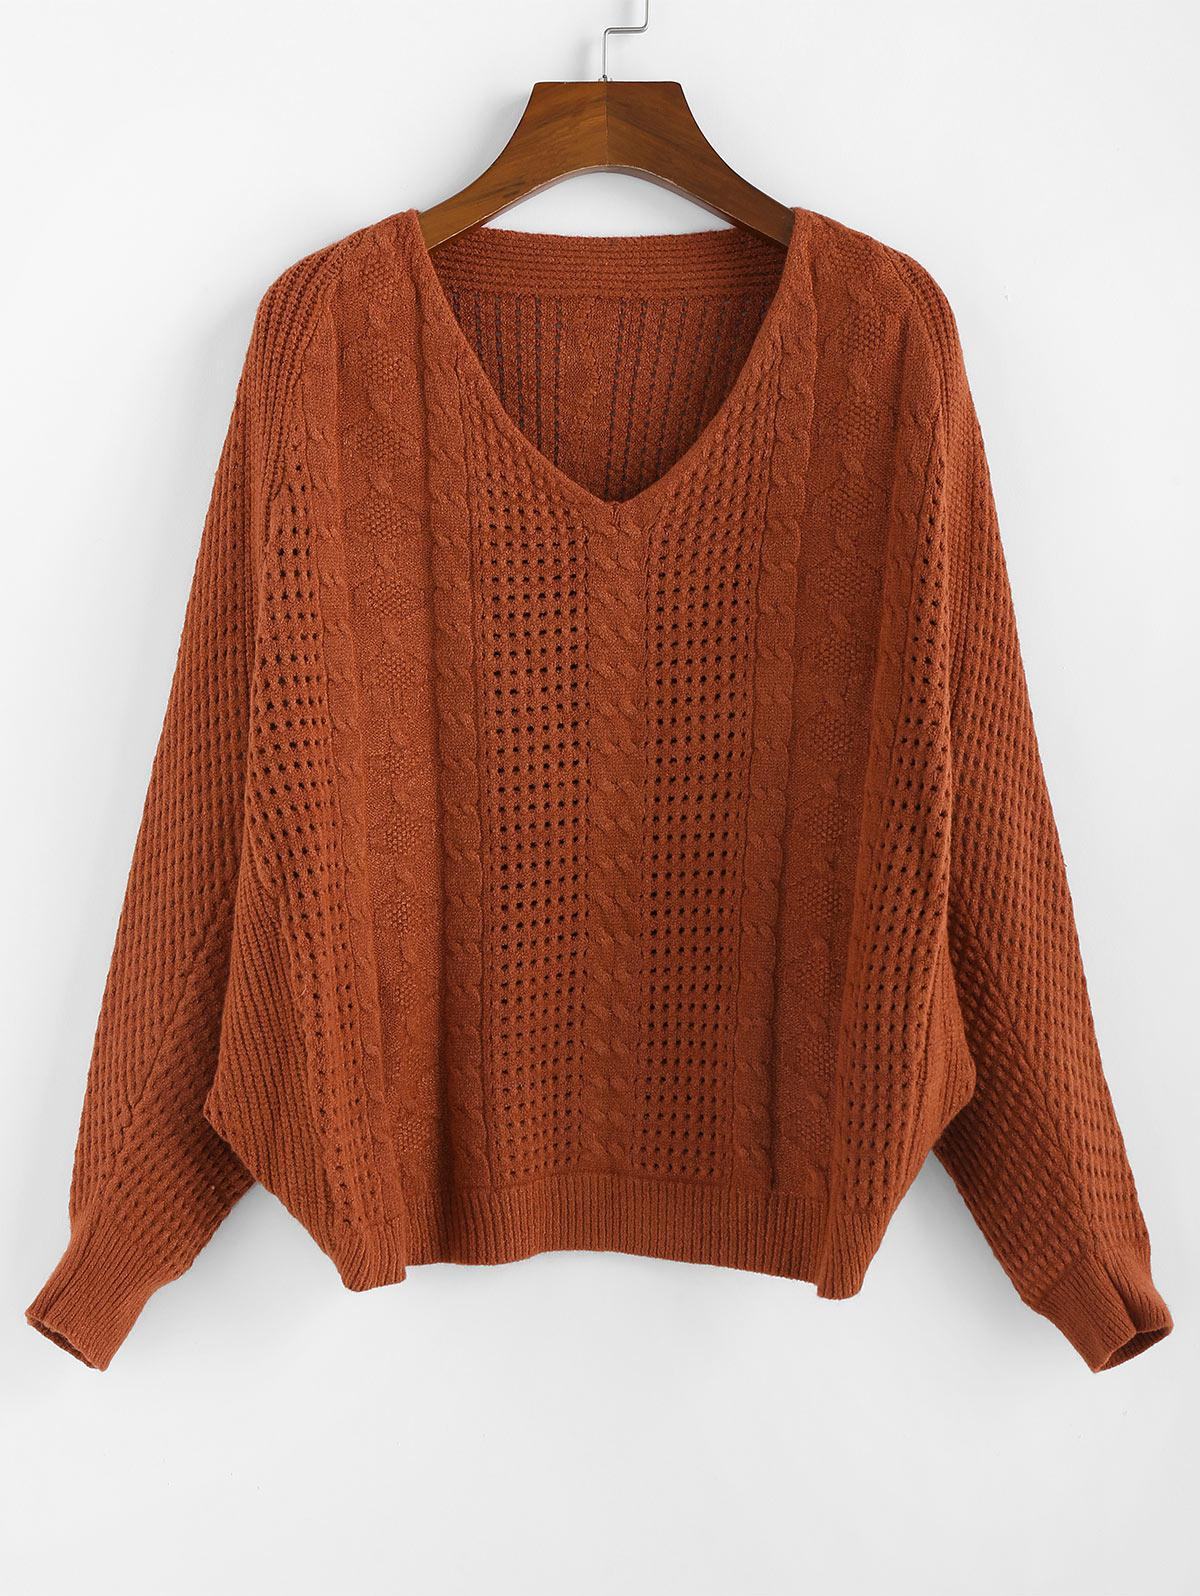 ZAFUL x Yasmine Bateman Dolman Sleeves V Neck Solid Open Knit Sweater